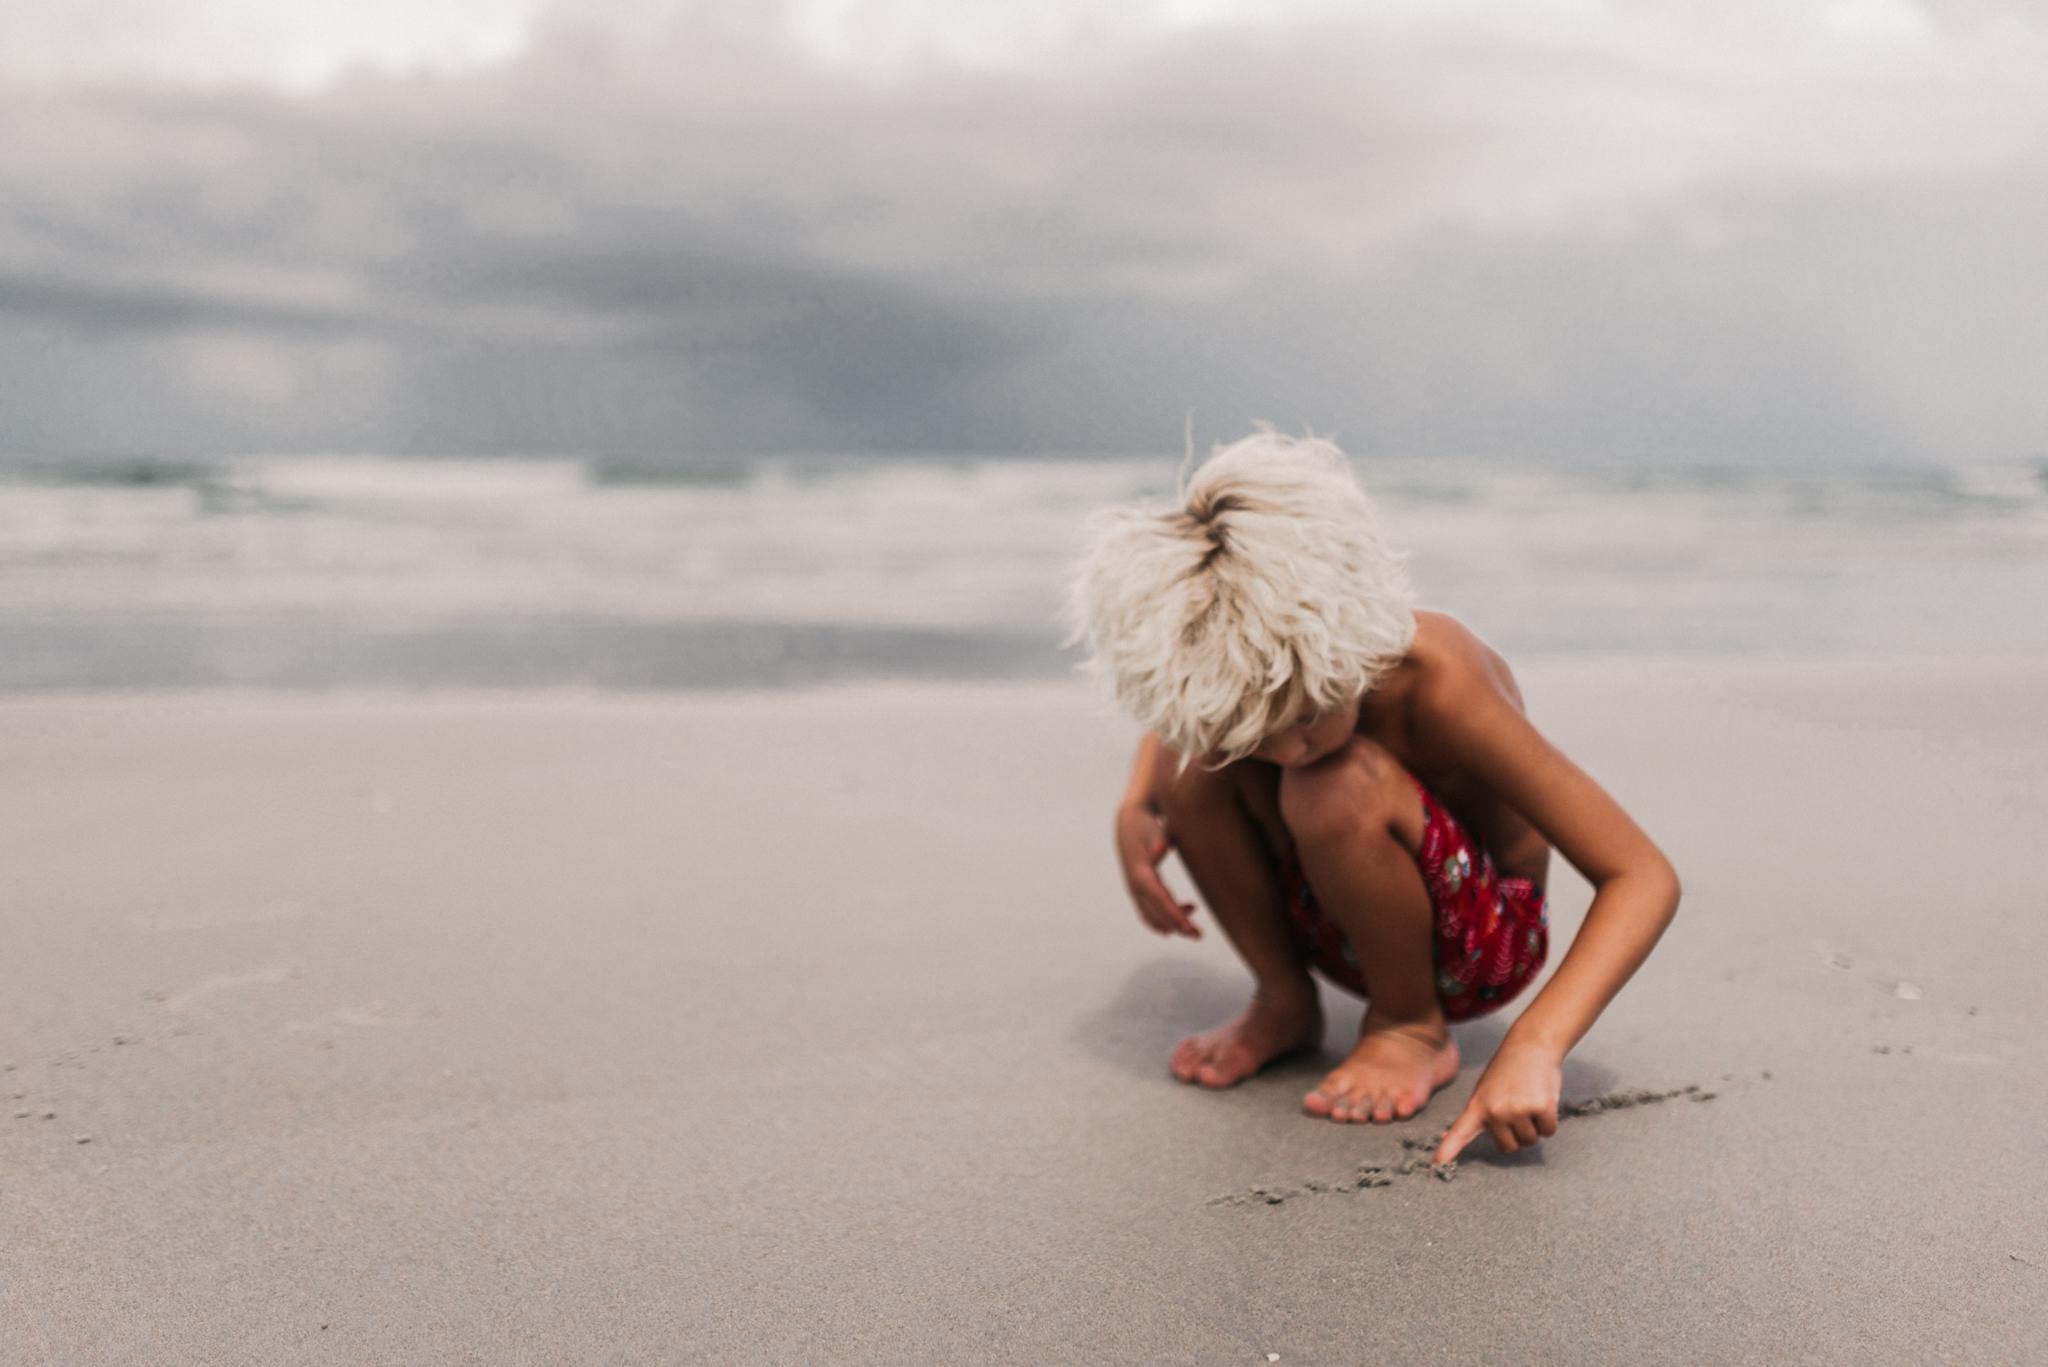 twyla jones photography - treasure coast florida - stormy beach boy playing in sand-2-3.jpg